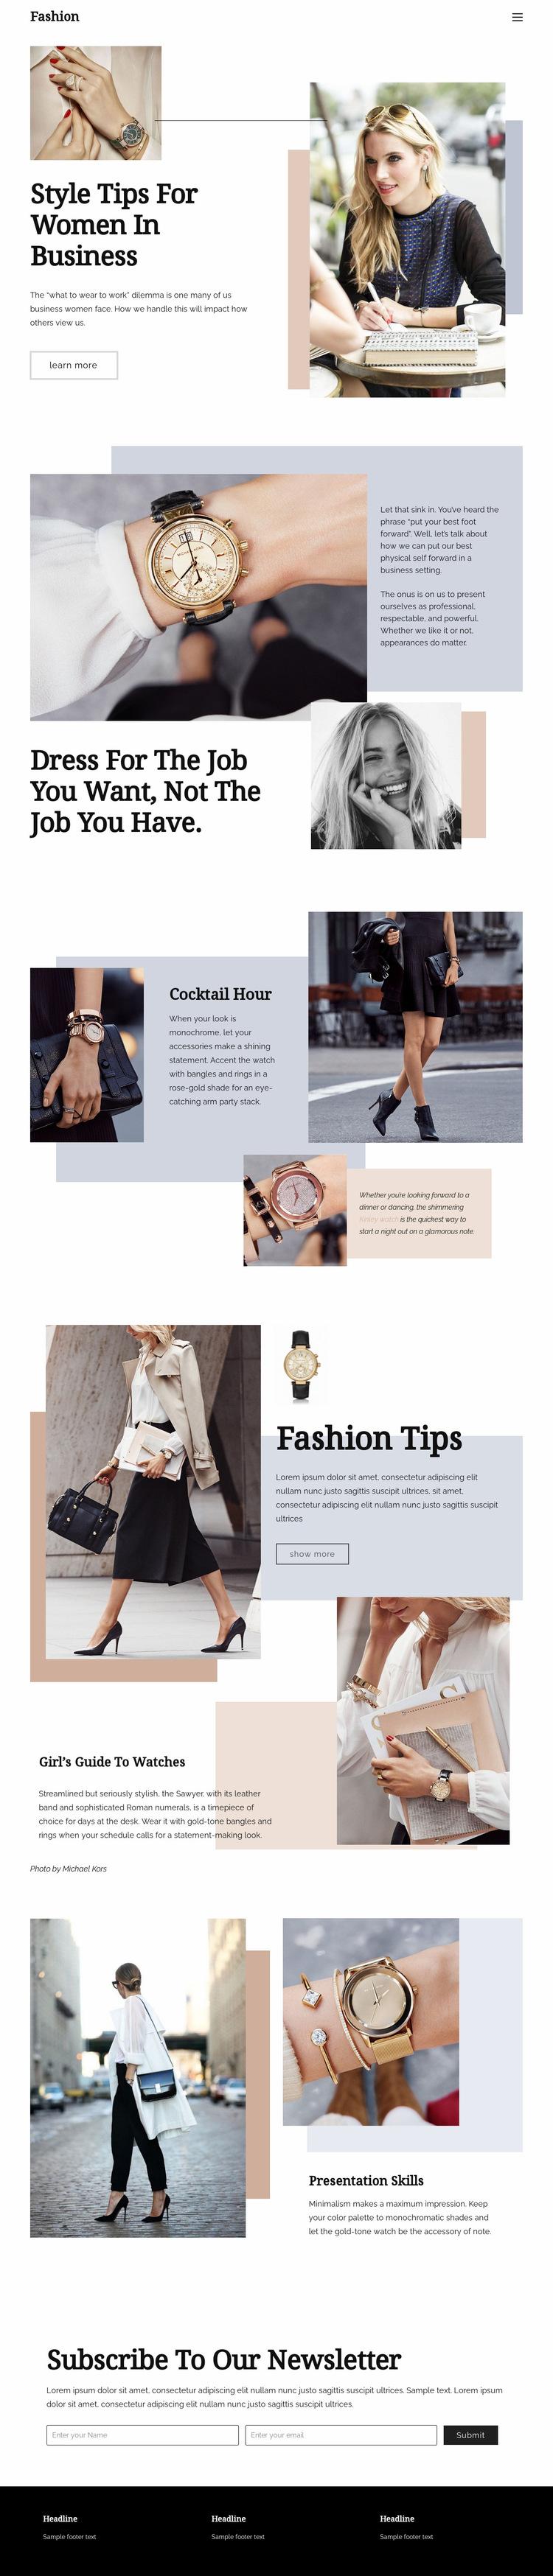 Fashion tips Web Page Design